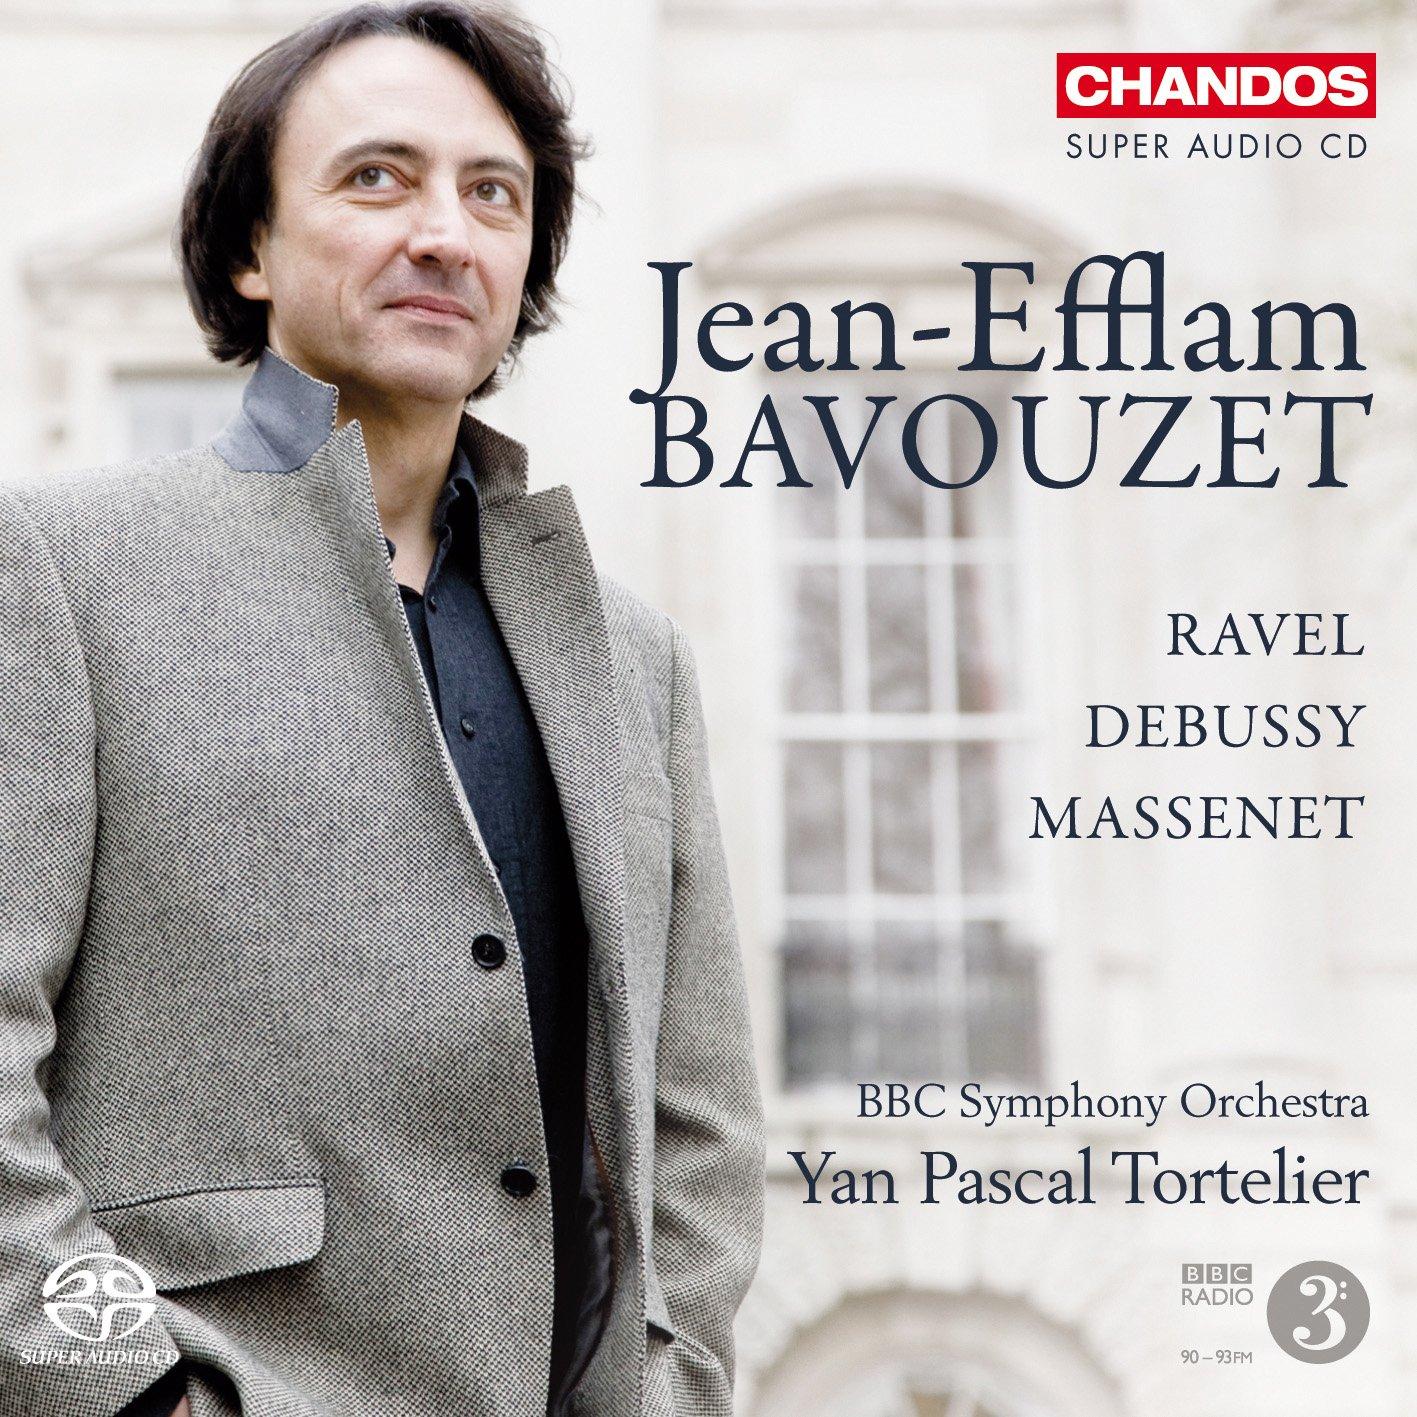 SACD : Jean-Efflam Bavouzet - Plays Works By Ravel Debussy & Massenet (SACD)